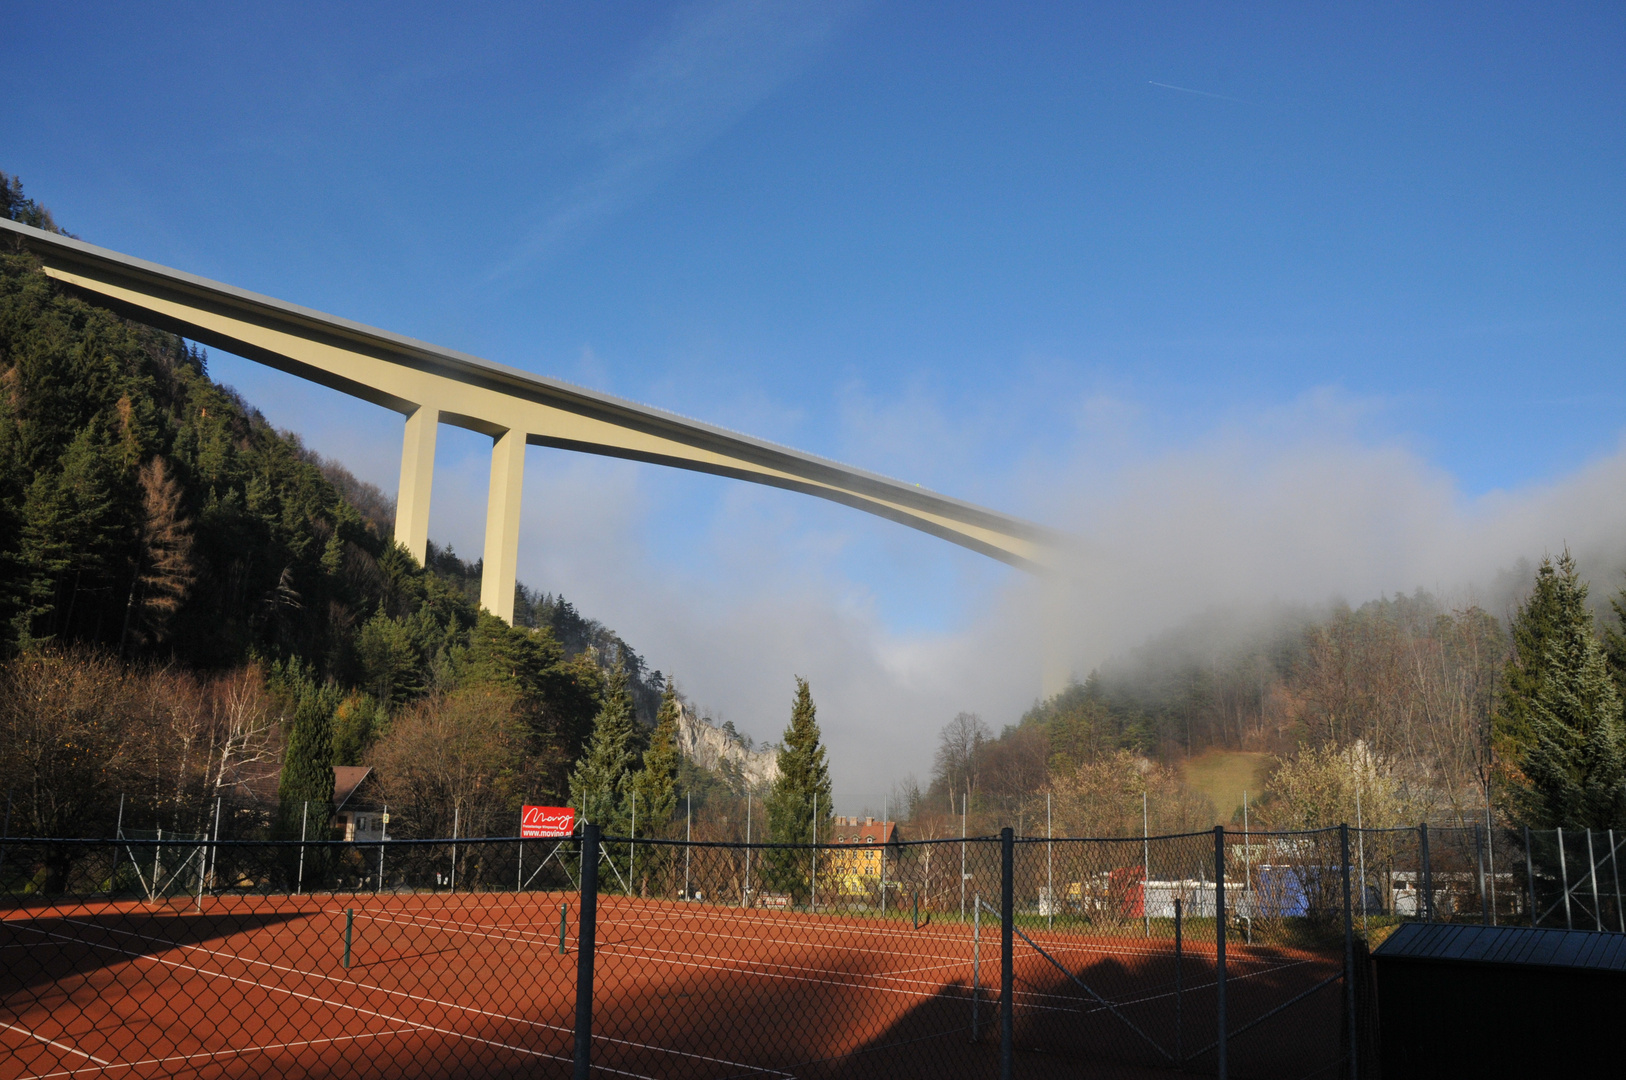 Brücke aus dem nichts 2